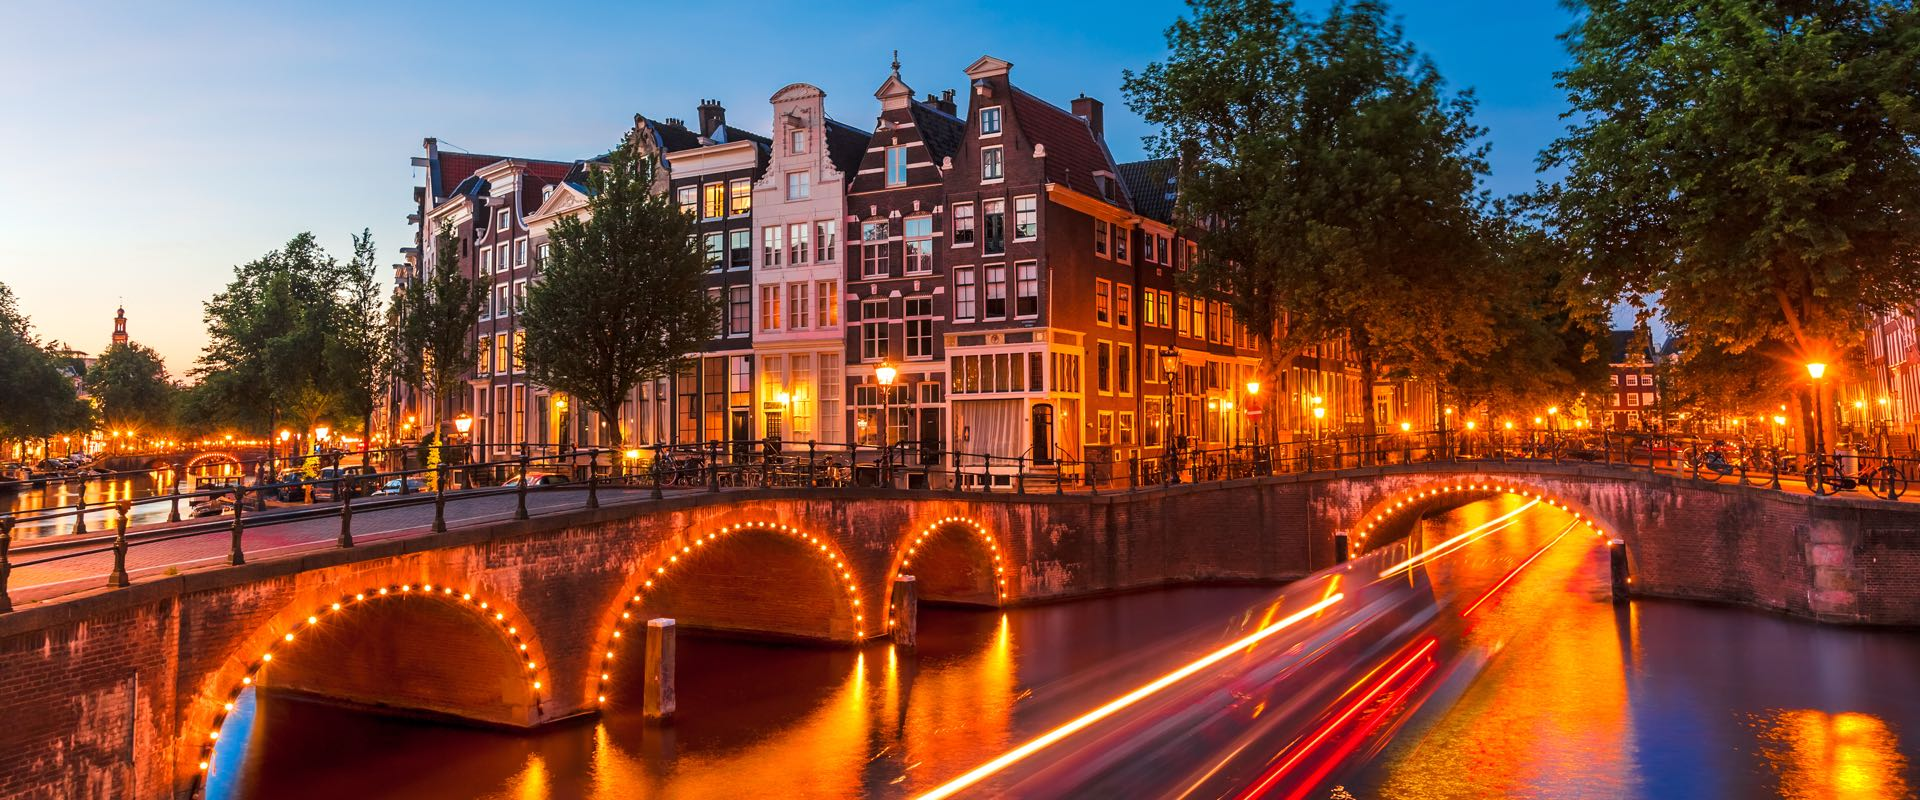 Voli Low Cost Per Amsterdam Paesi Bassi Da 20 Offerte